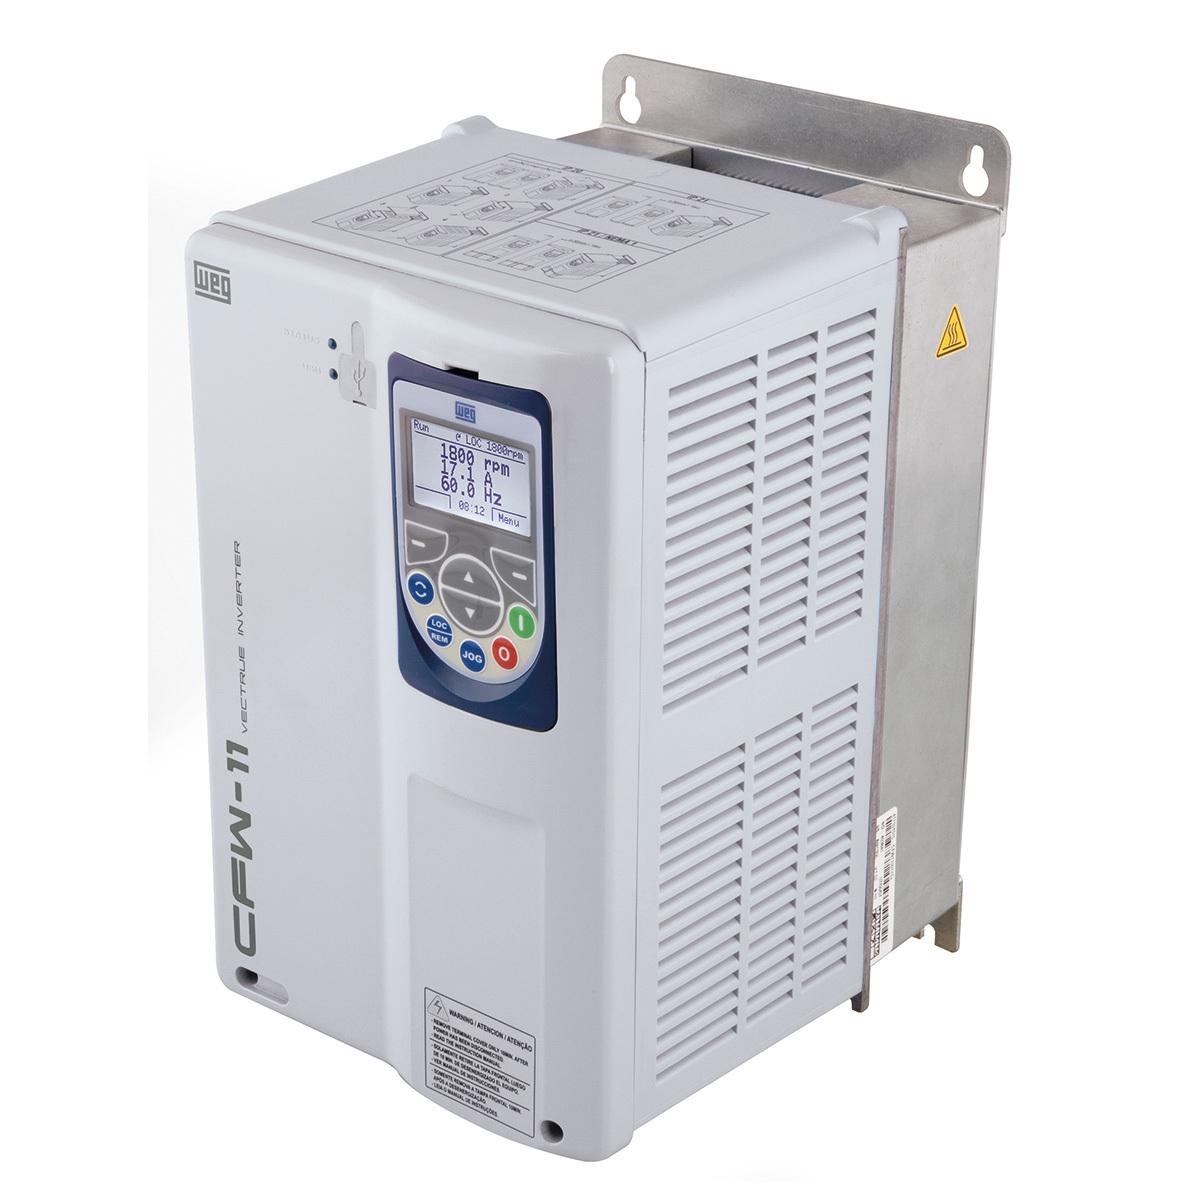 WEG Electric AC Drives